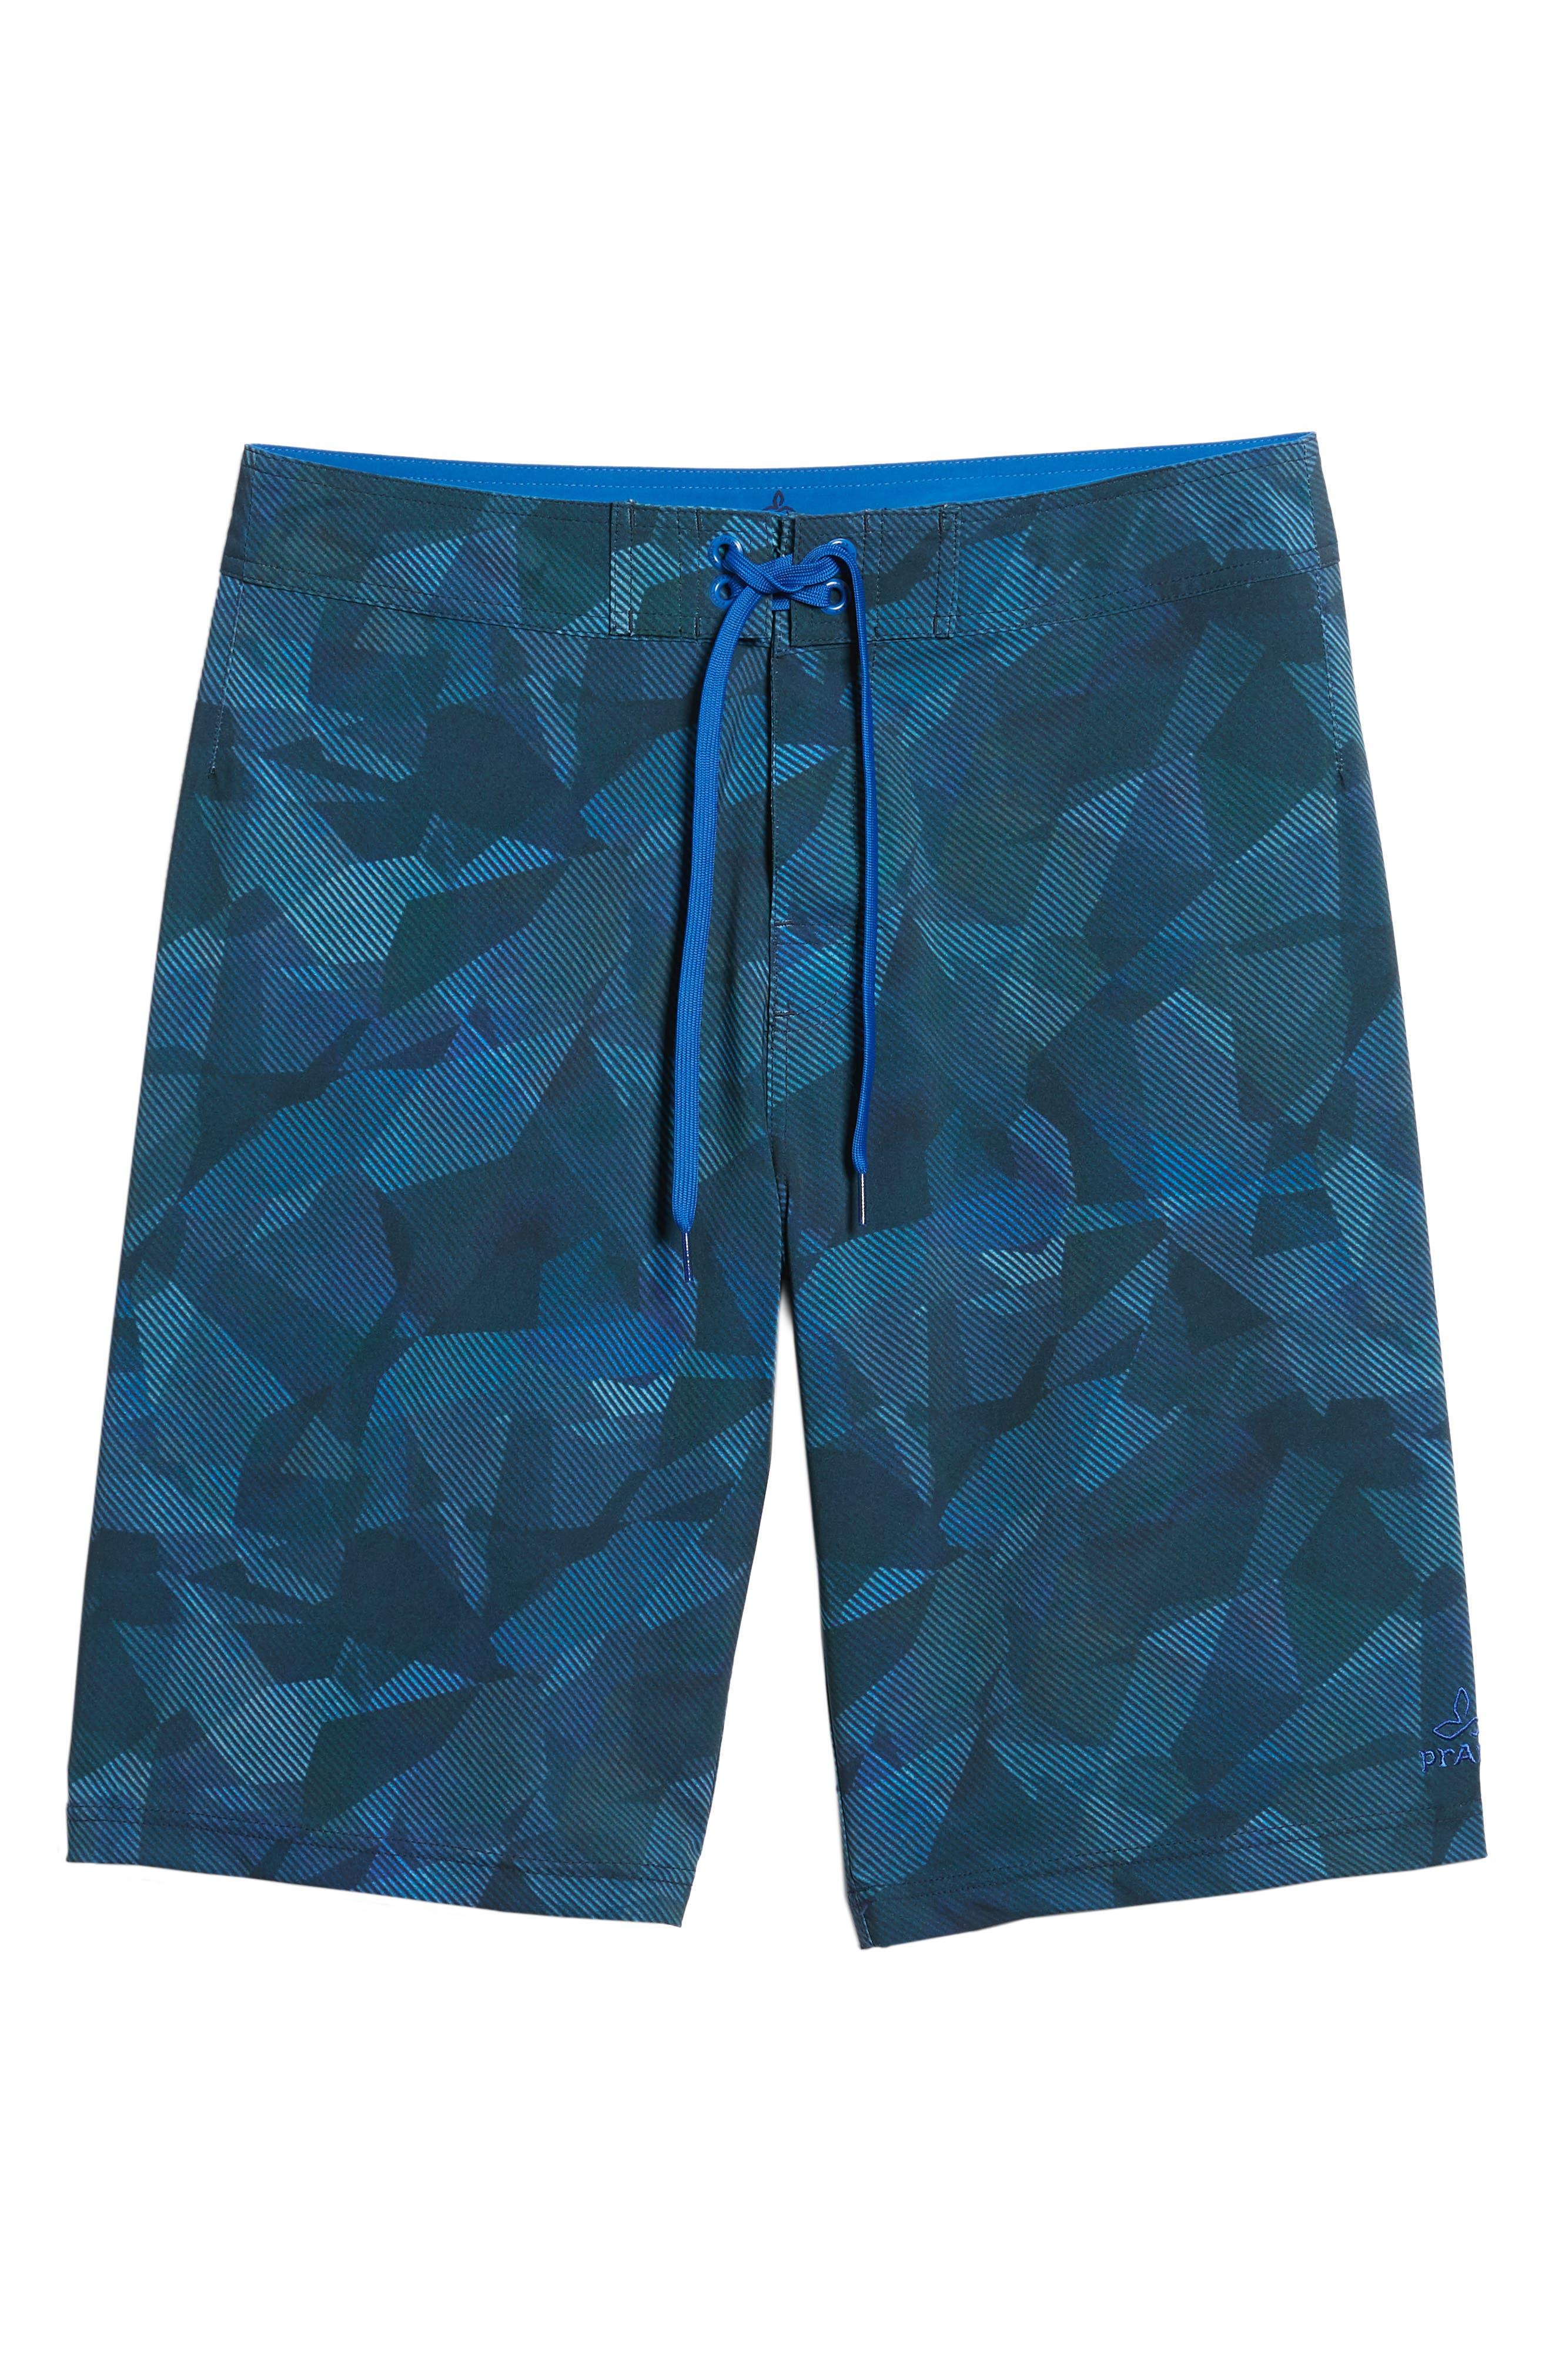 'Sediment' Stretch Board Shorts,                             Alternate thumbnail 76, color,